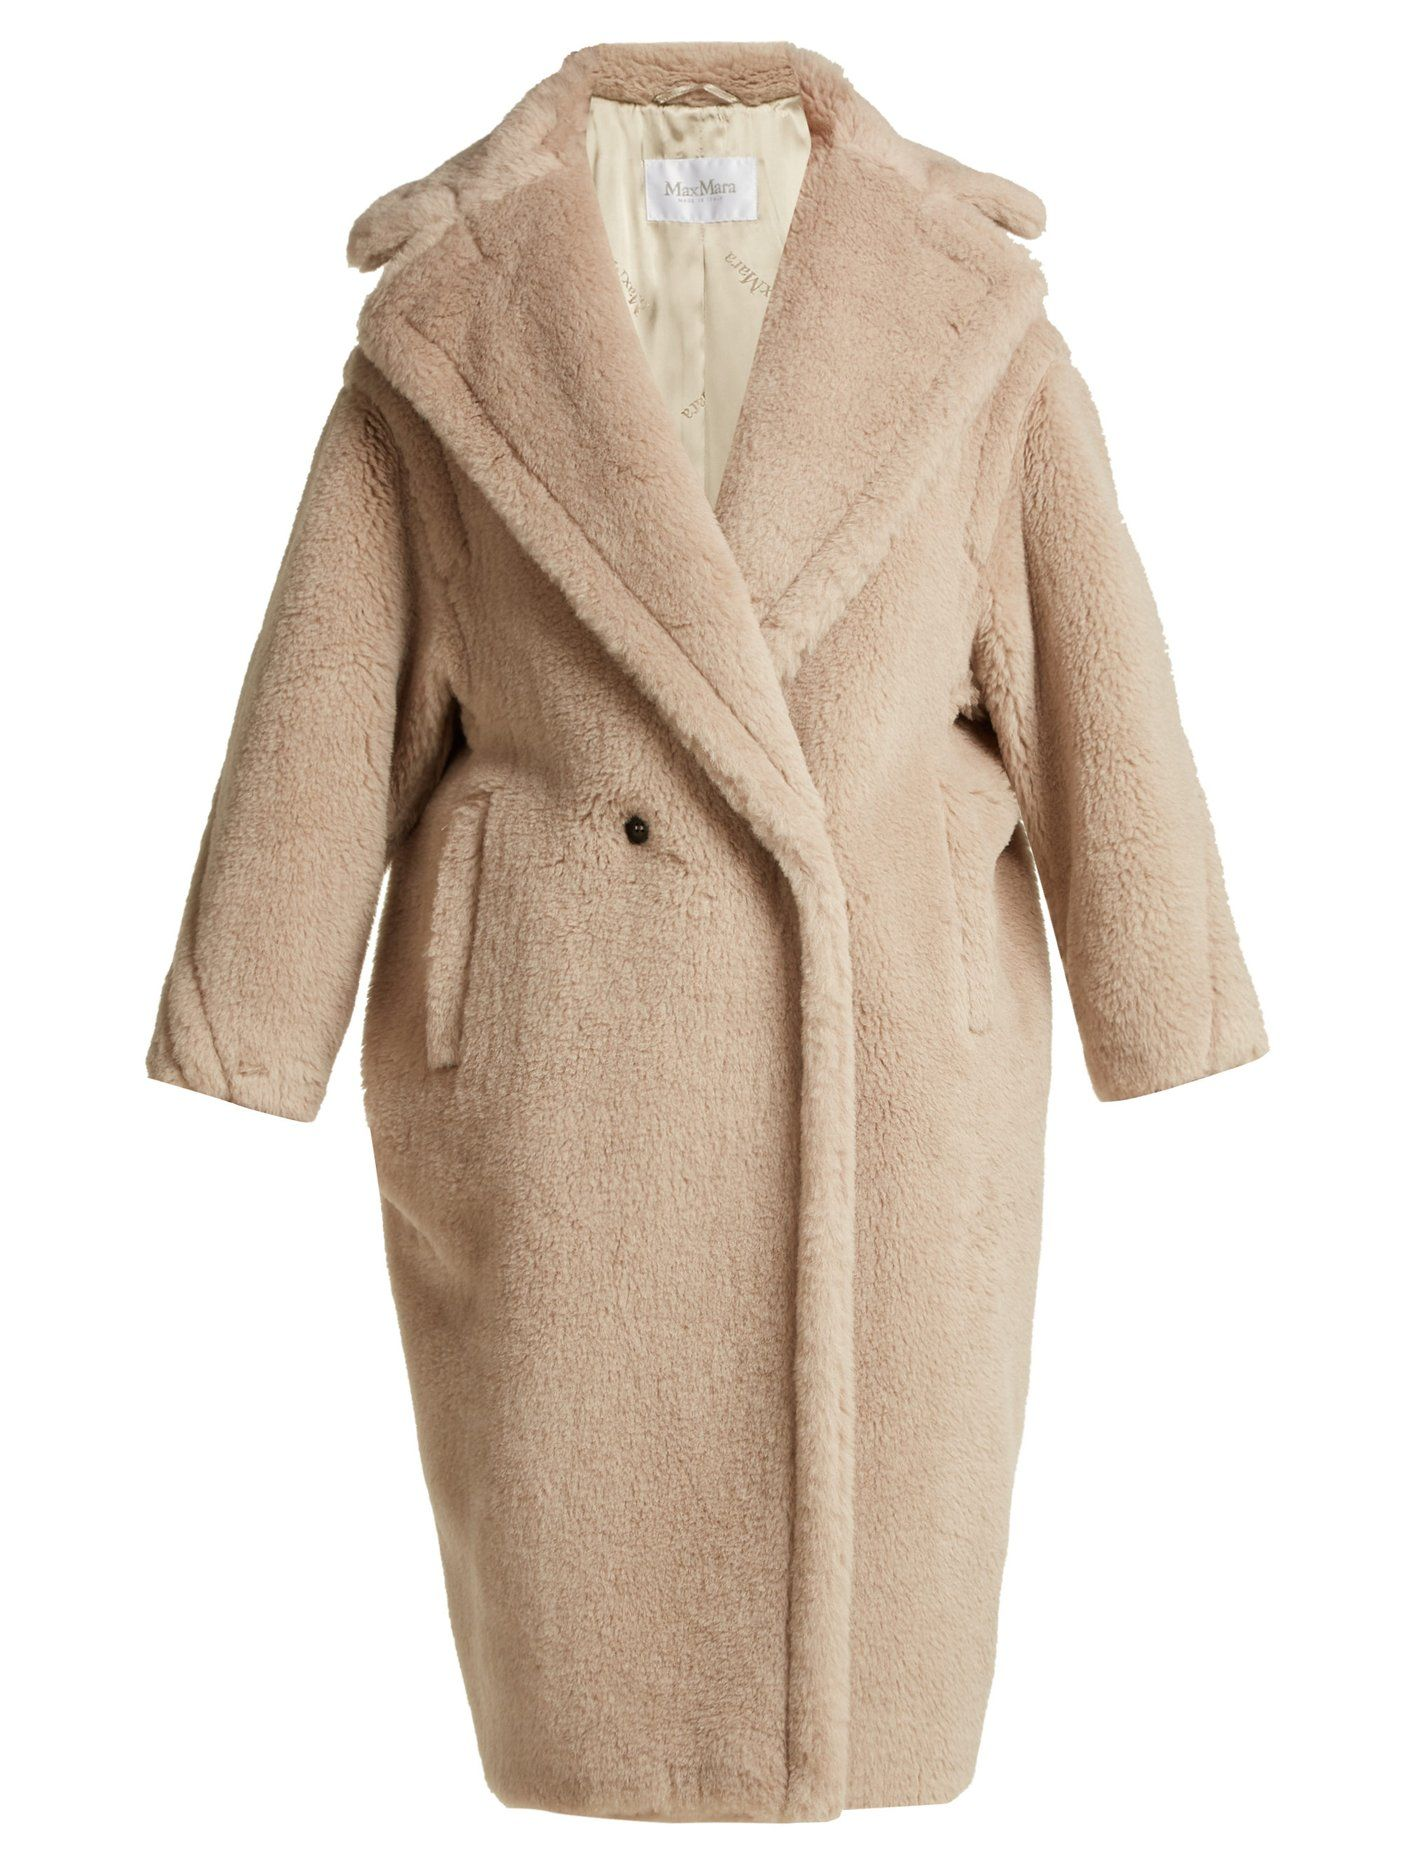 a59fefca64a Ginnata coat